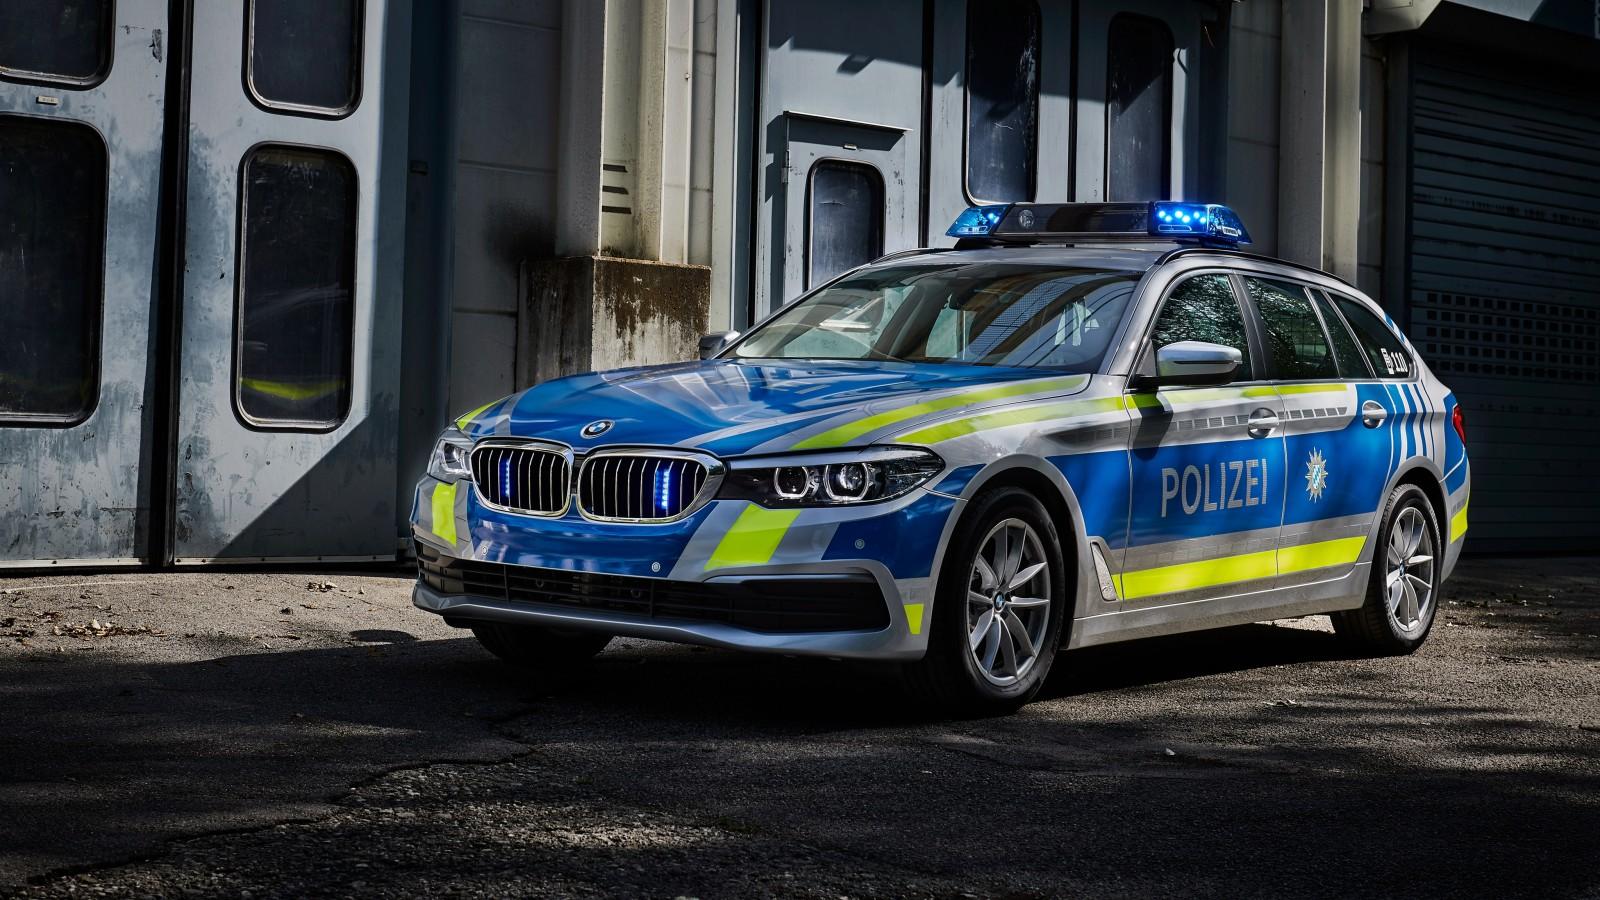 2017 Bmw 530d Xdrive Touring Polizei Wallpaper Hd Car Wallpapers Id 8383